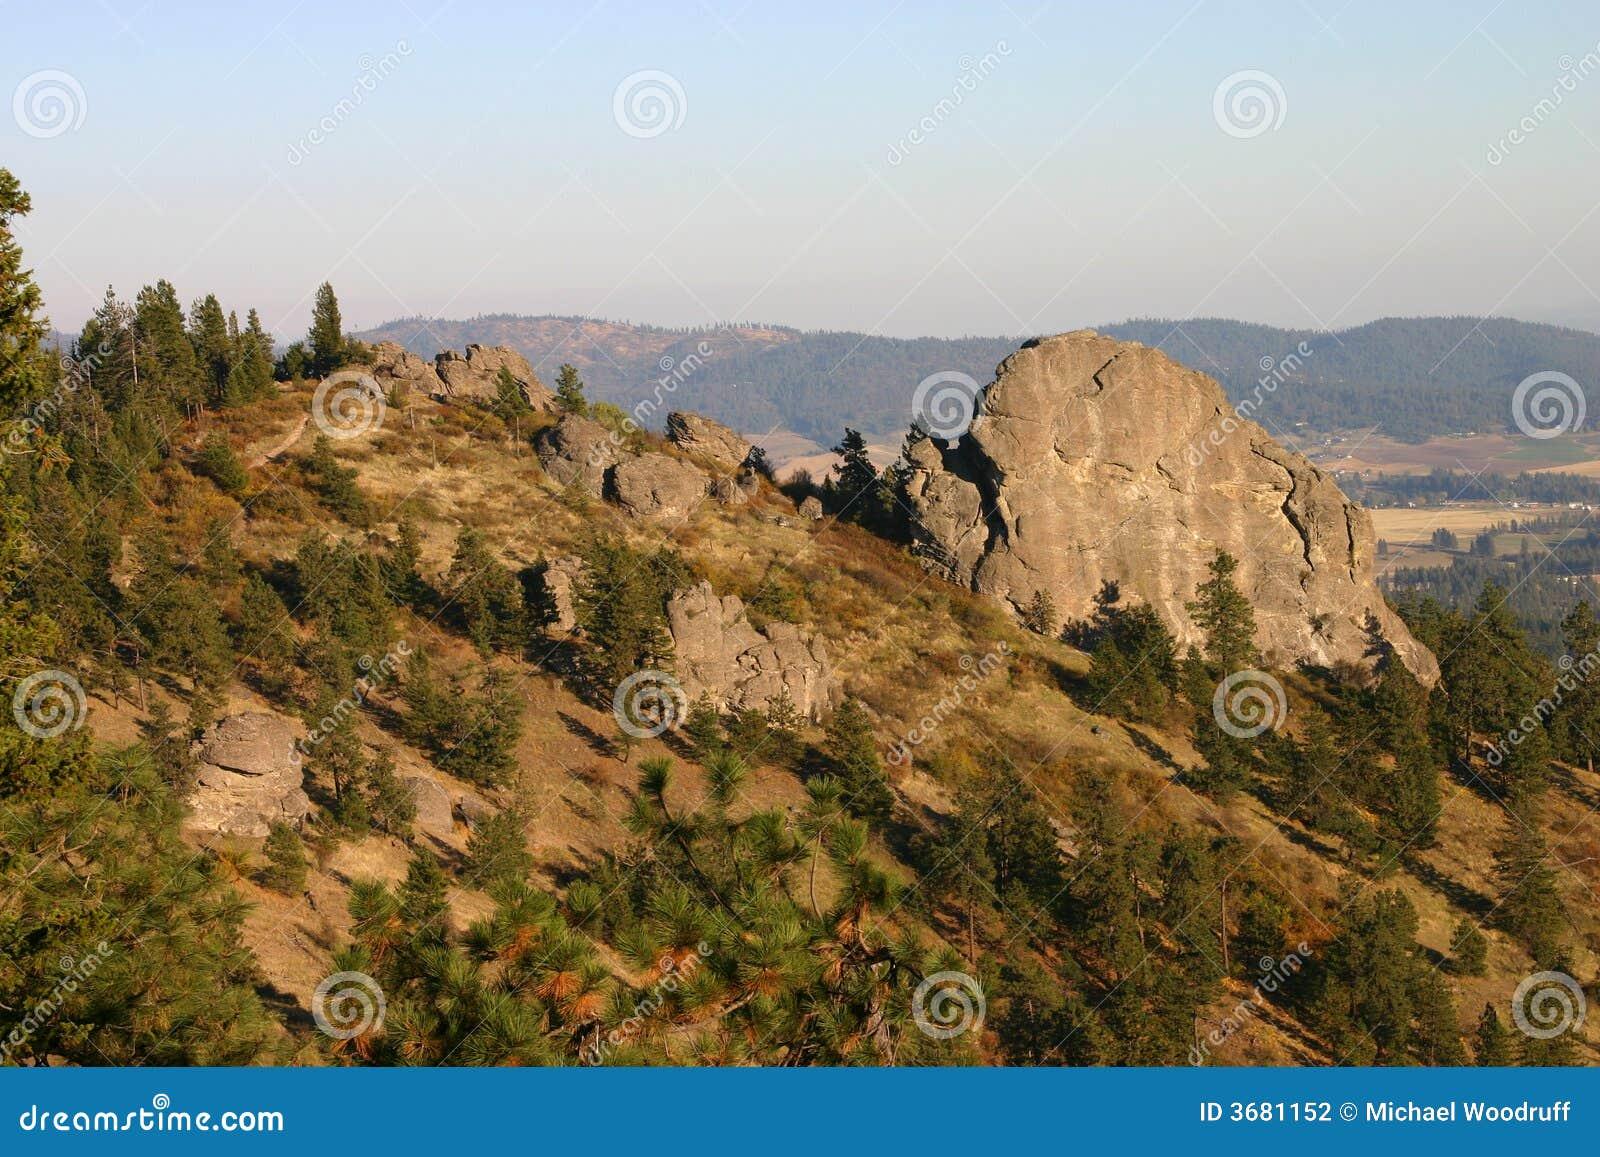 Landscape Boulders Spokane : Big rock stock photography image